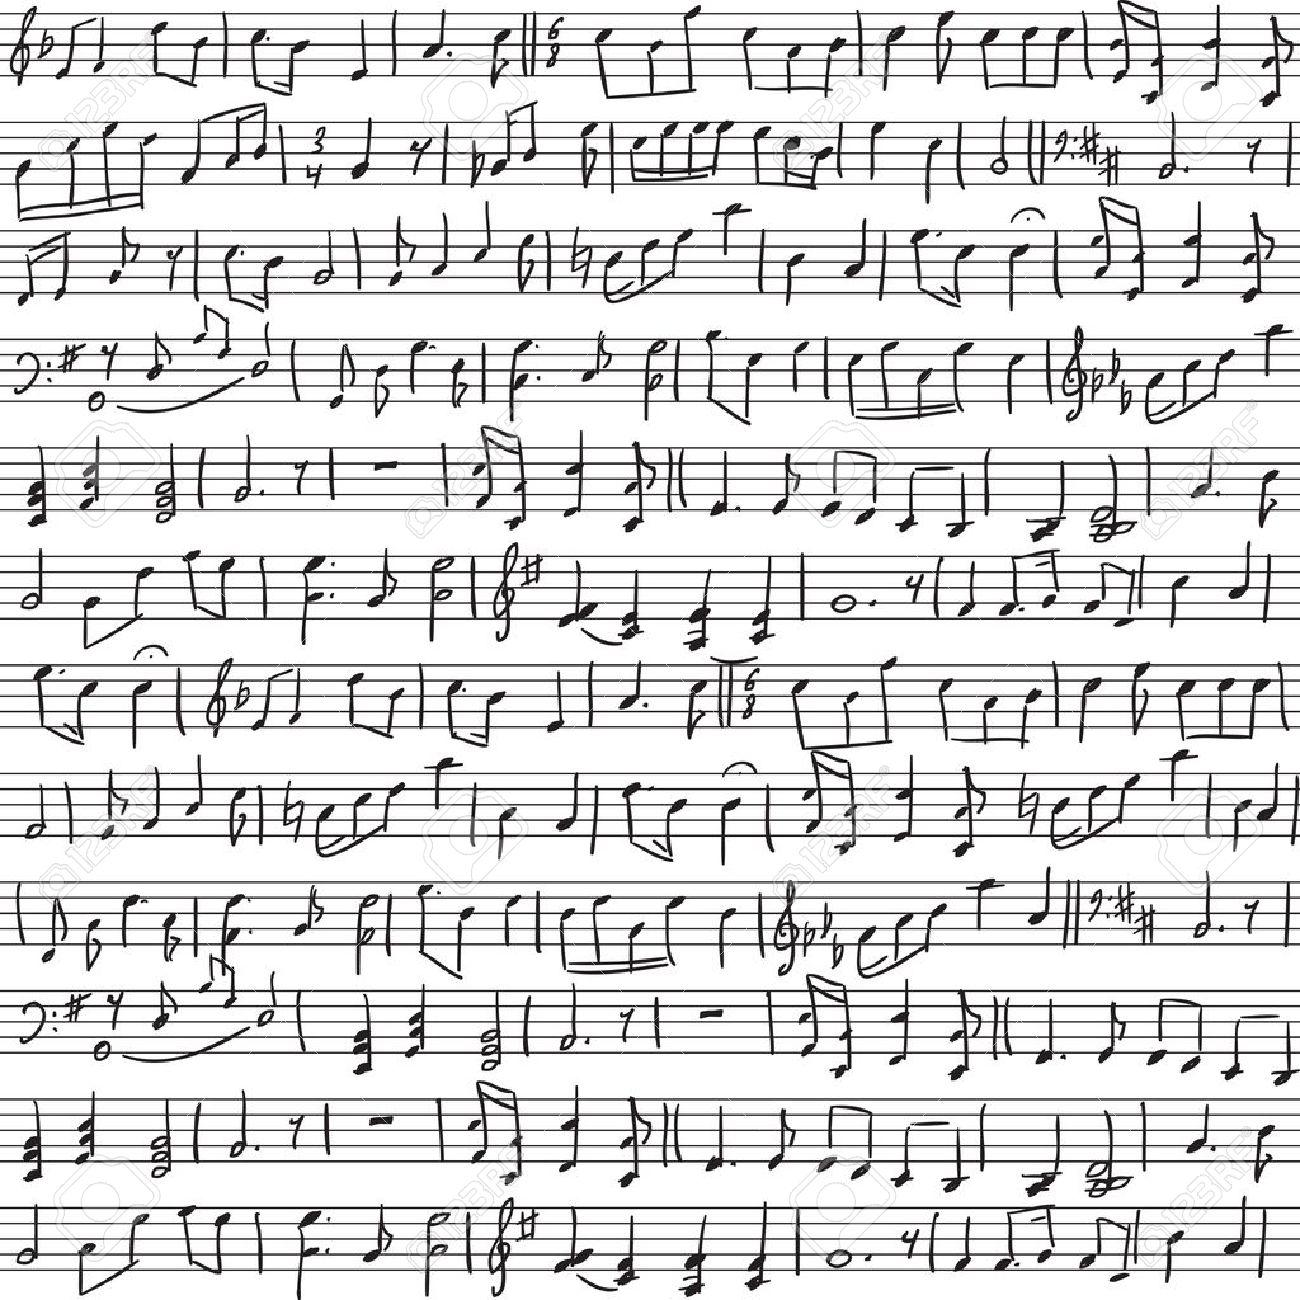 Handwritten Music With Handwritten Musical